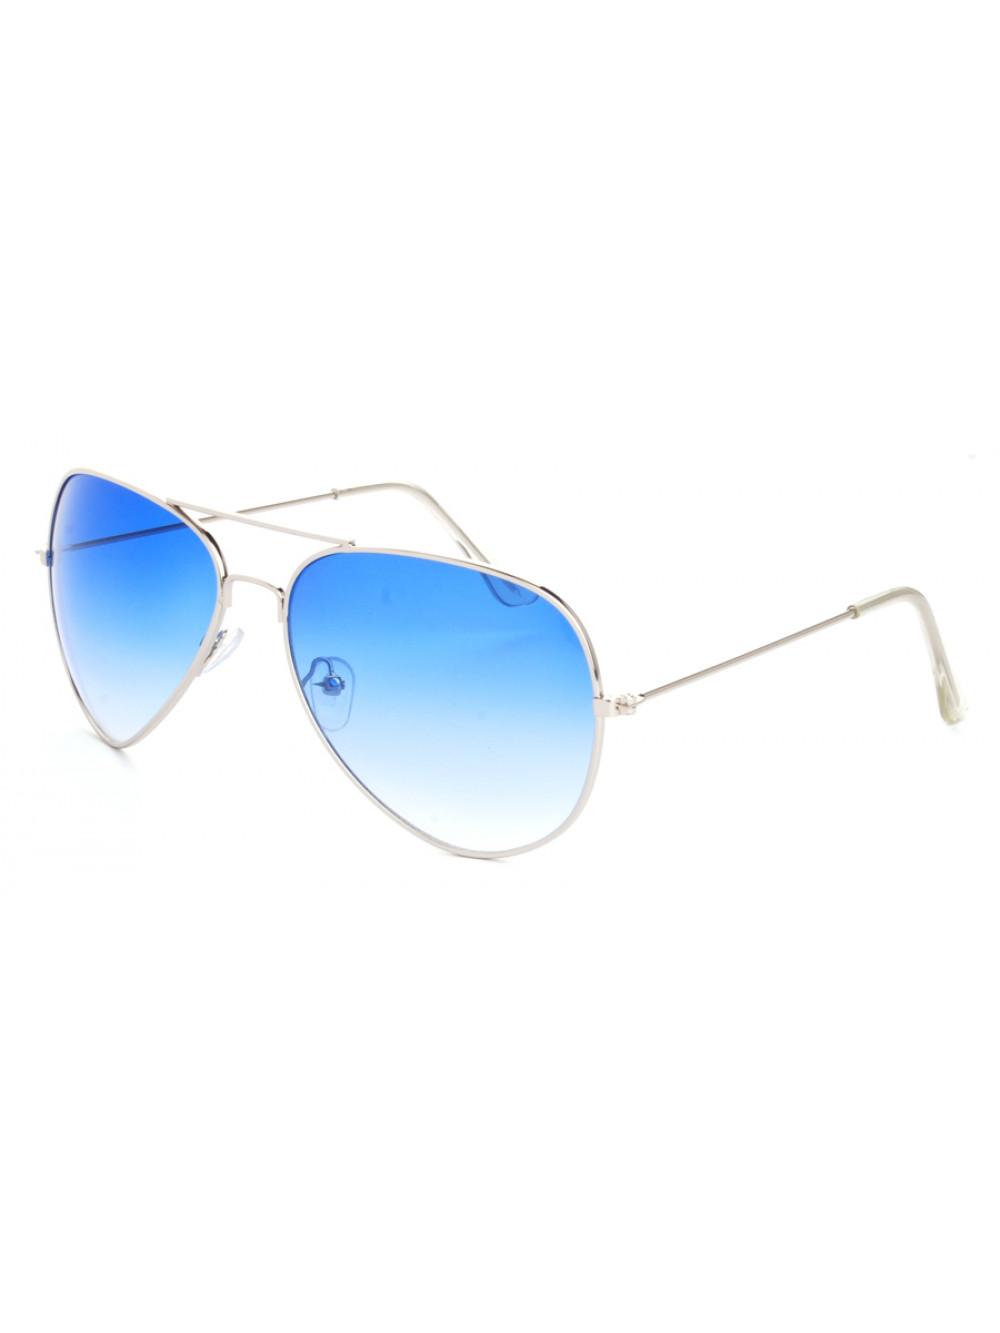 Slnečné okuliare Aviator Pilot Light Blue